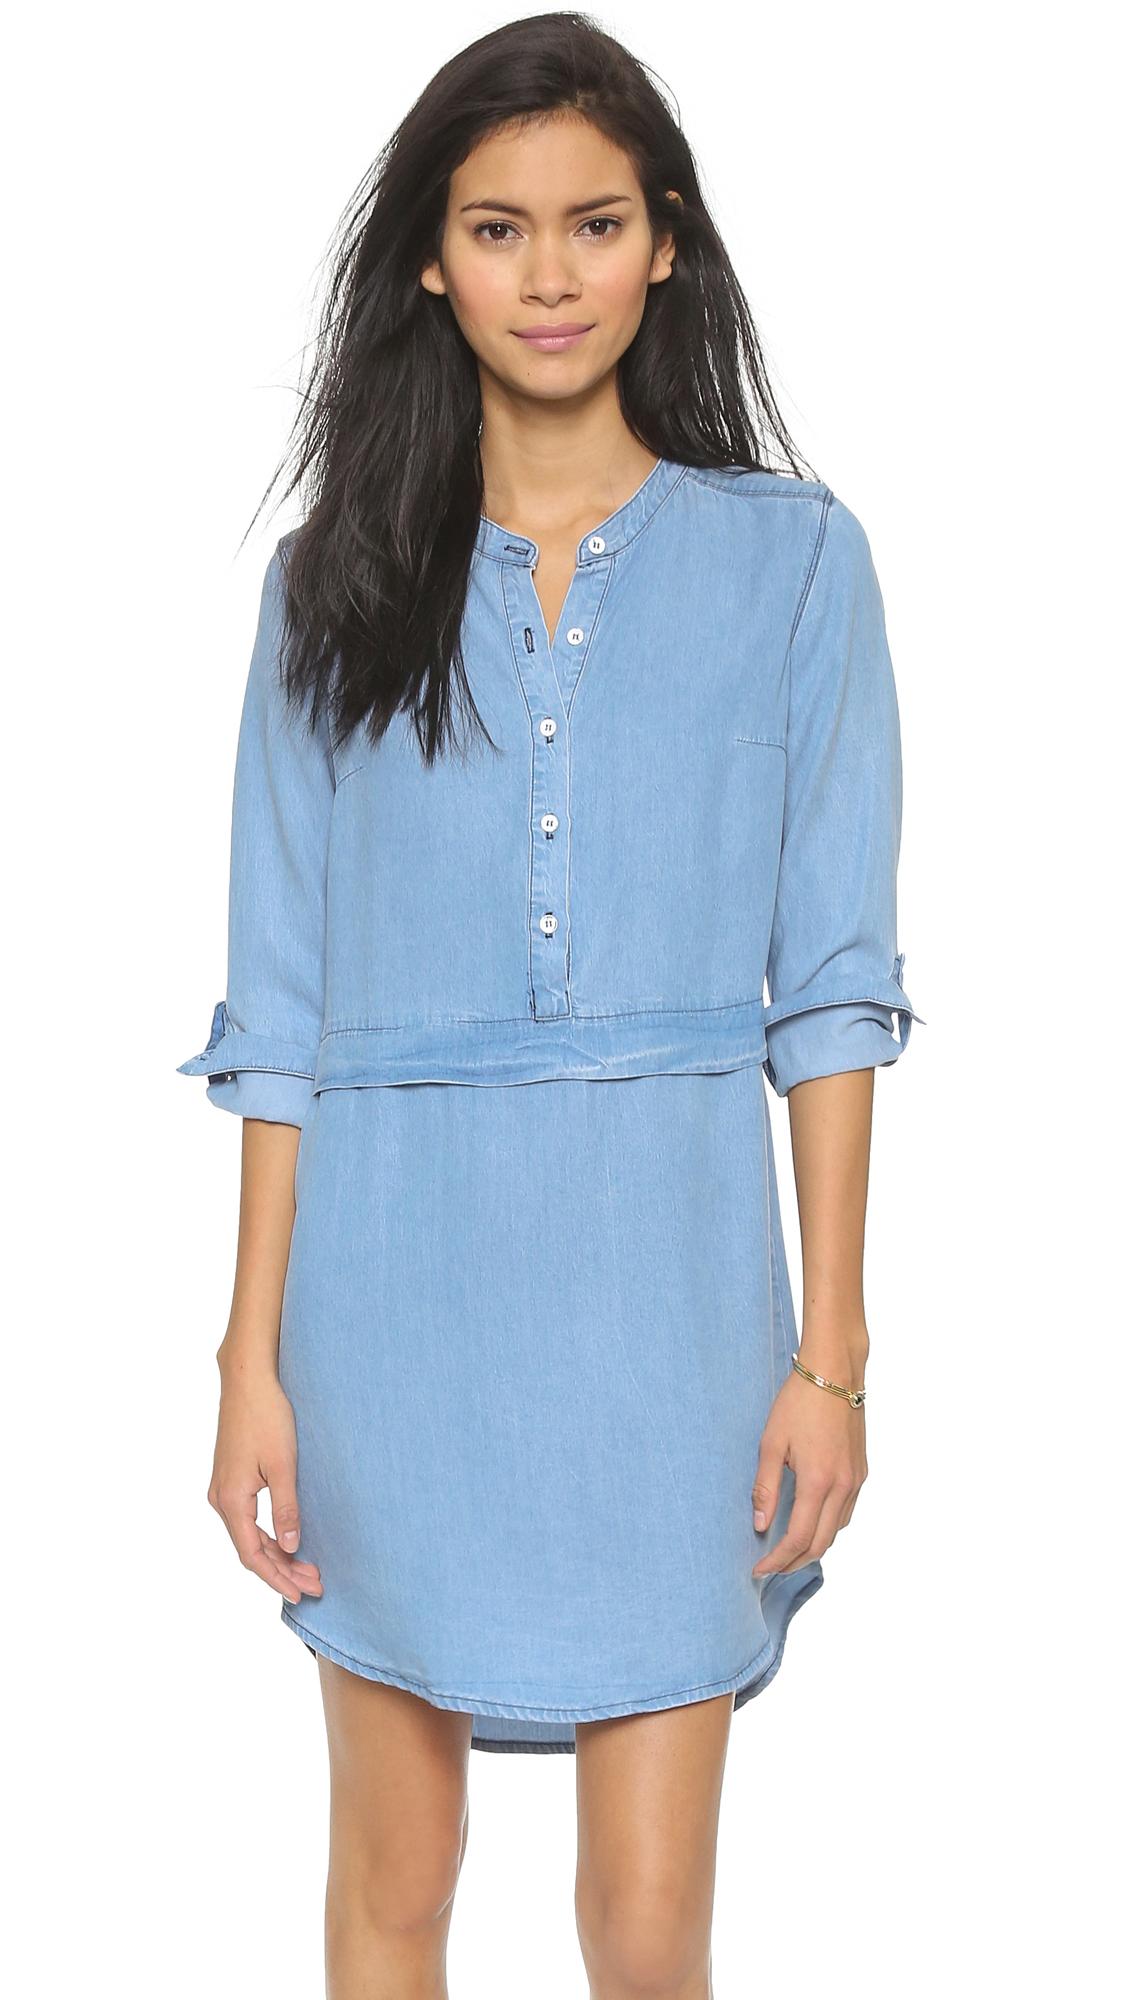 ad40c4d141 Splendid Chambray Shirtdress